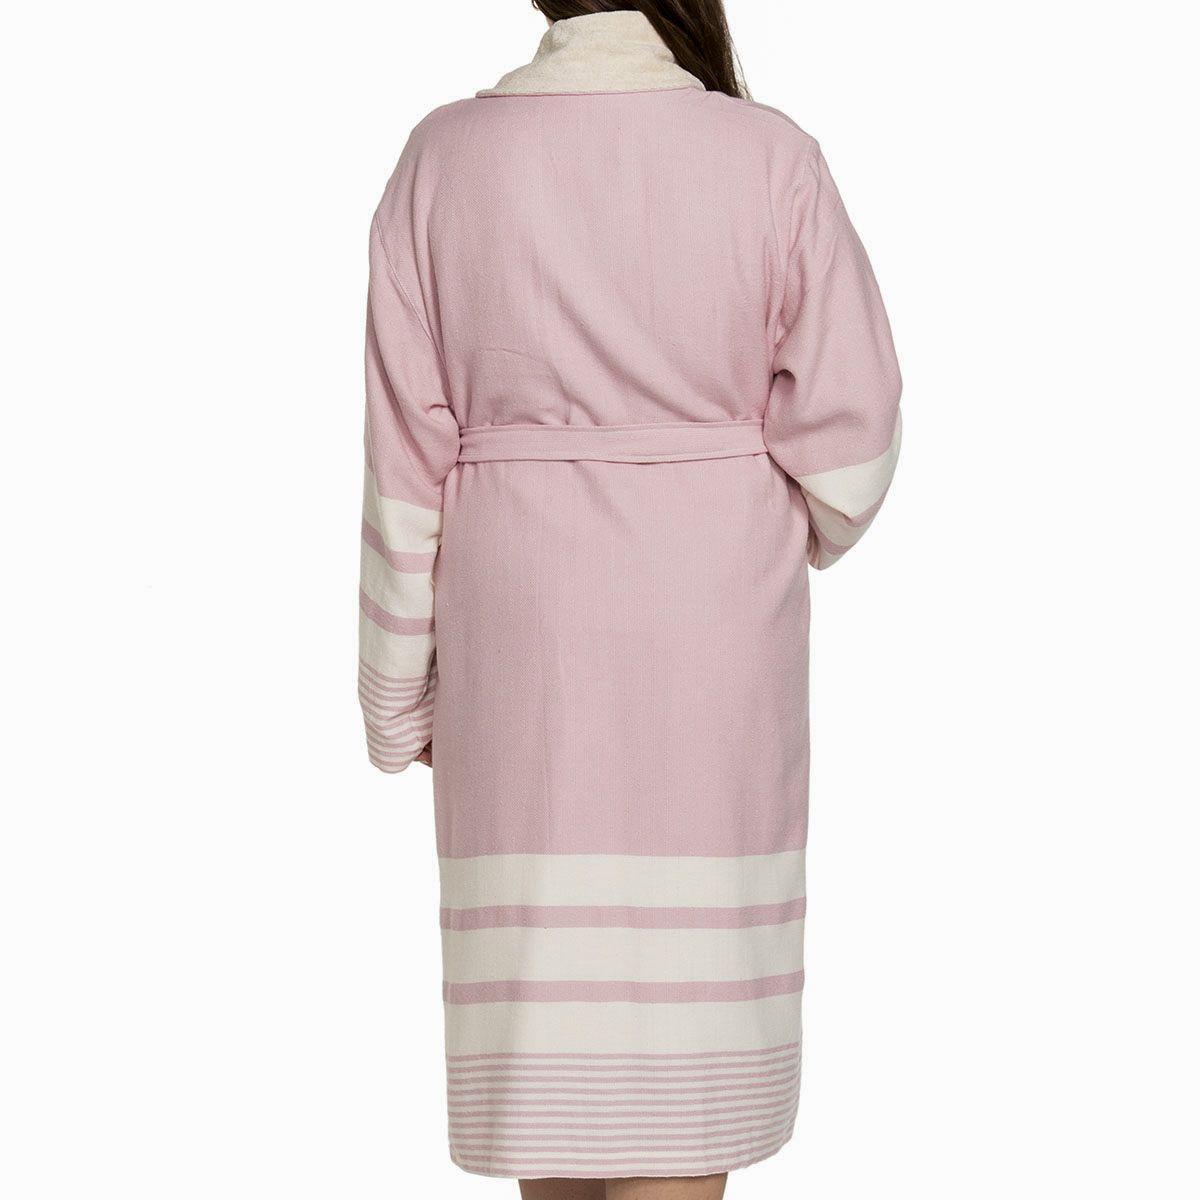 Bathrobe Tabiat with towel - Rose Pink